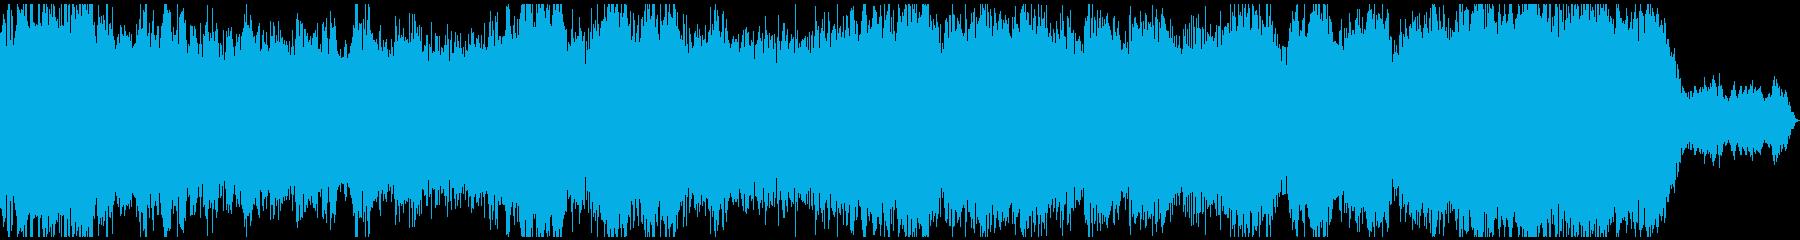 PADS 謎のミステリー01の再生済みの波形